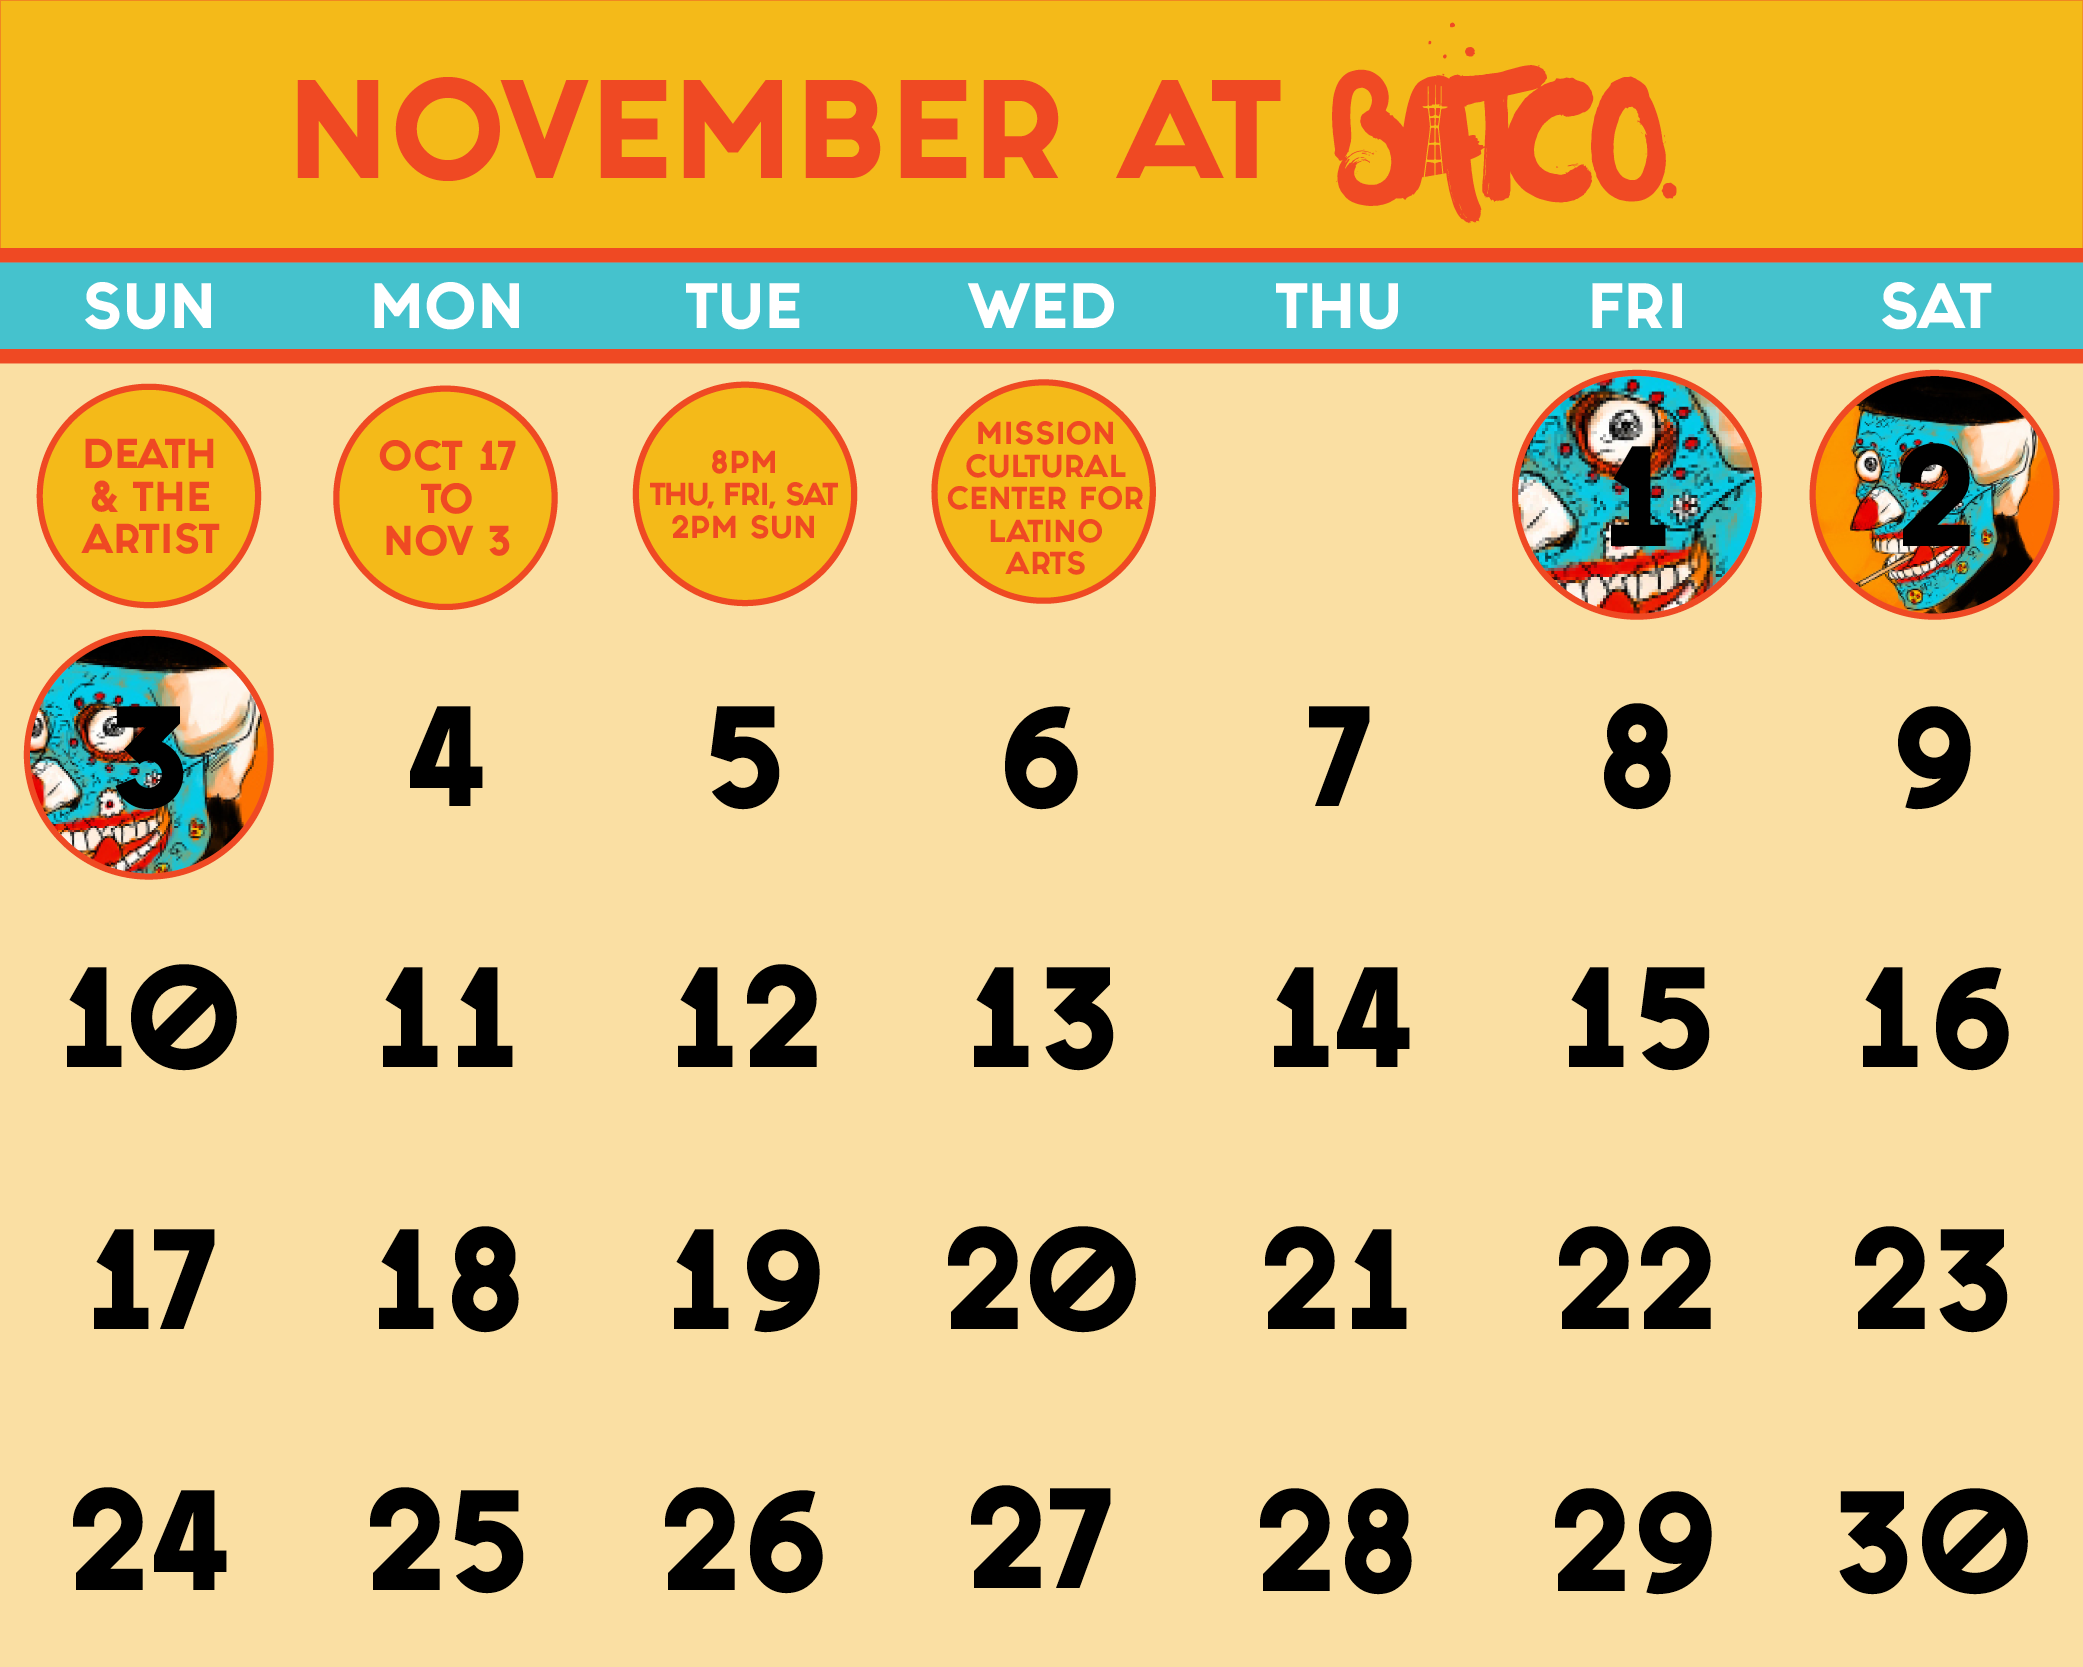 BATCO-November-2.png